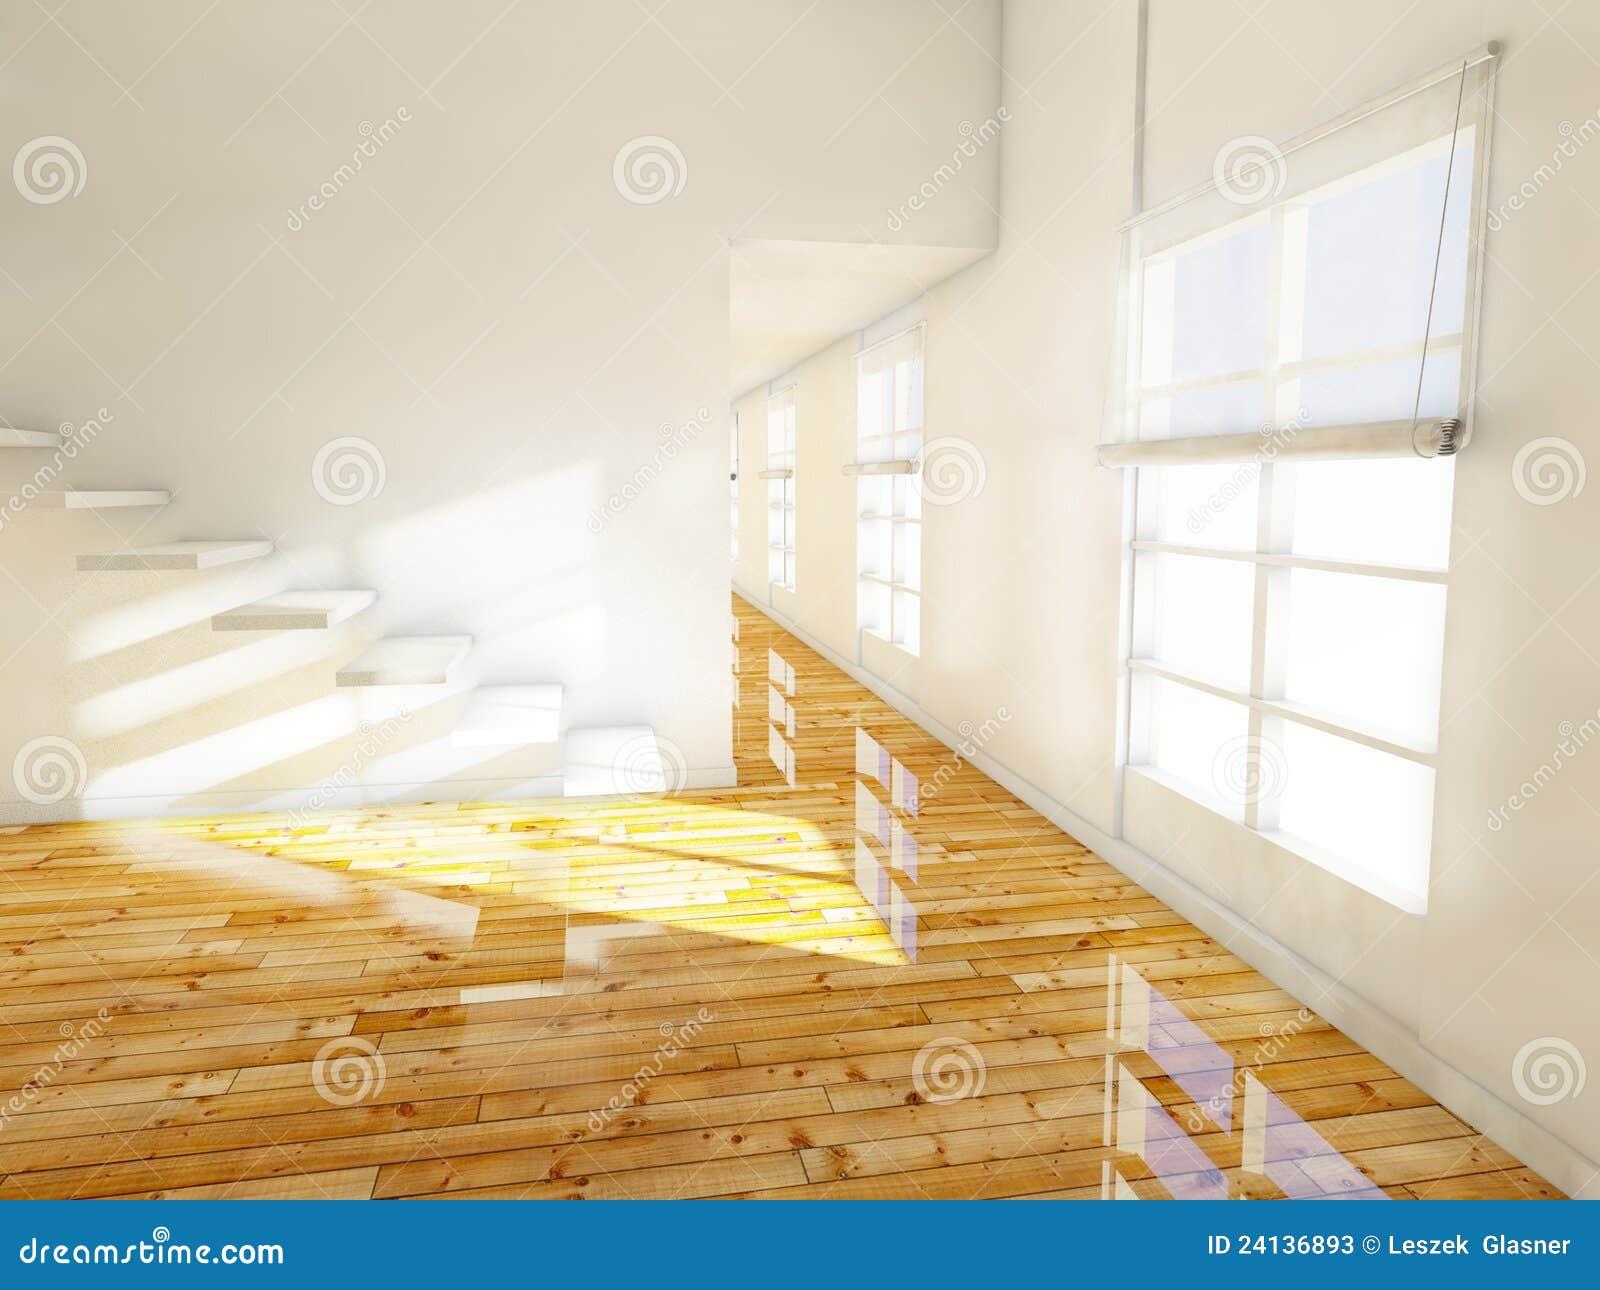 leerer raum innenraum des hauses 3d stockfotos bild 24136893. Black Bedroom Furniture Sets. Home Design Ideas